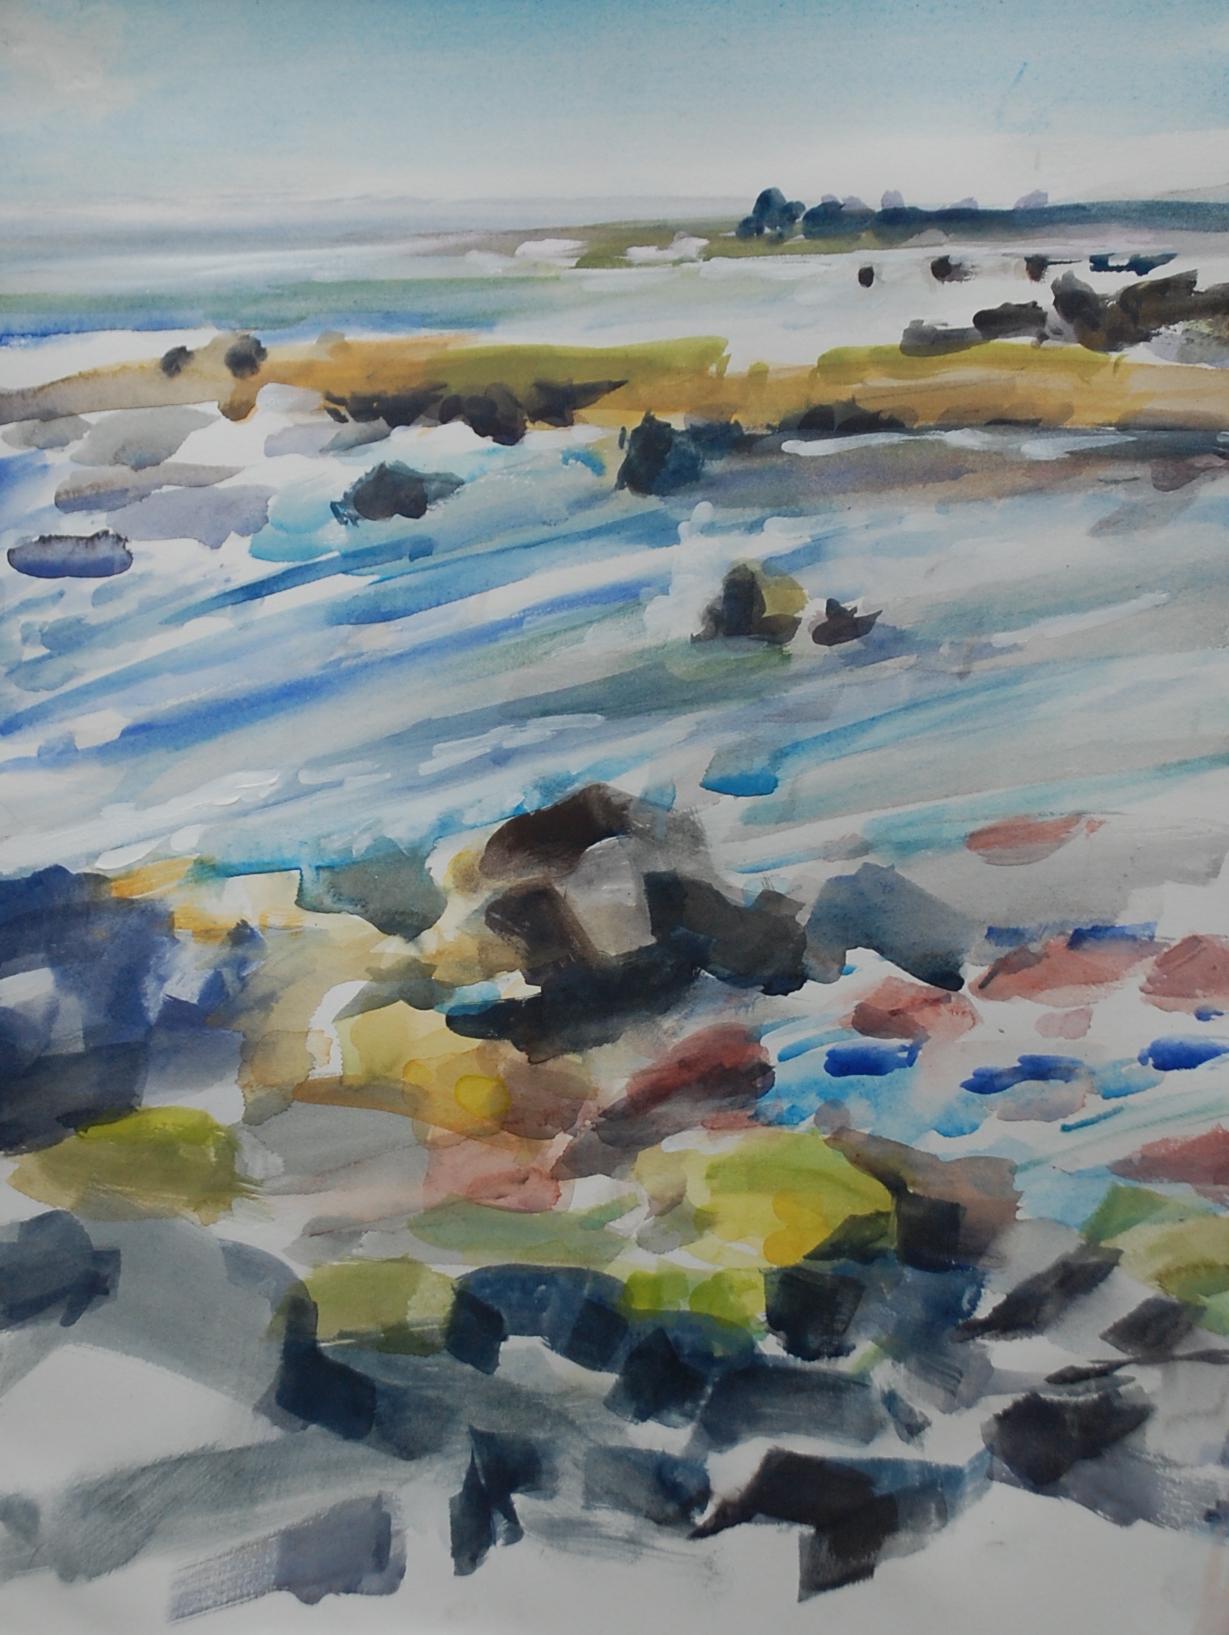 Too Windy to Snorkel, Pico Island, study